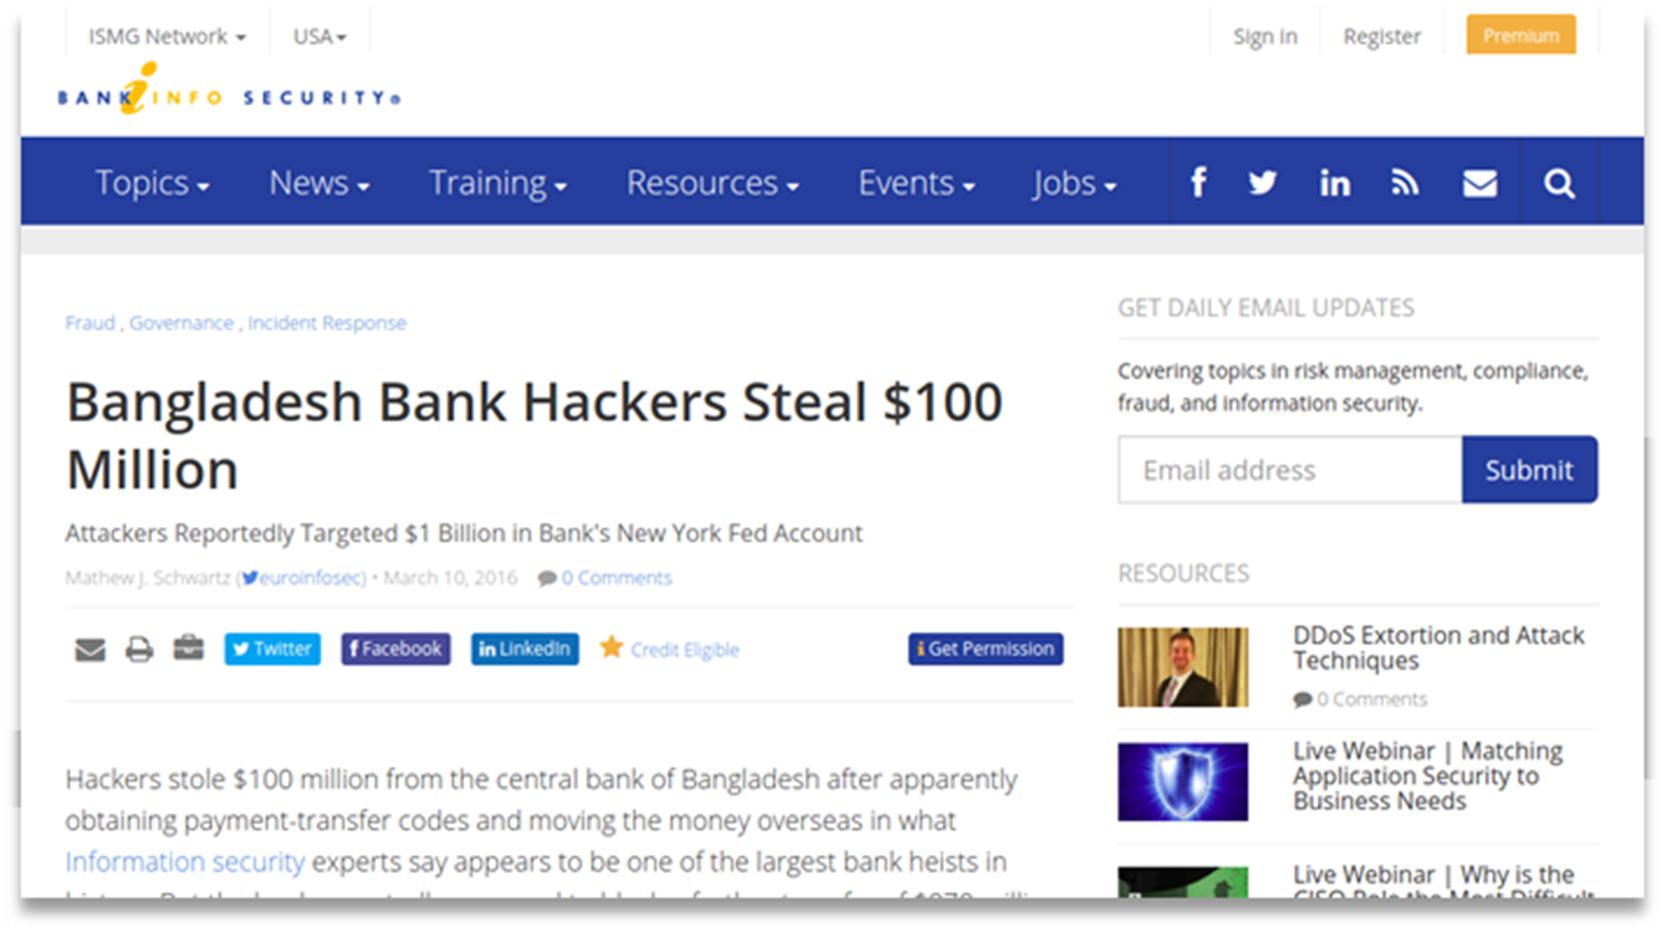 The Bangladesh Bank heist - initial